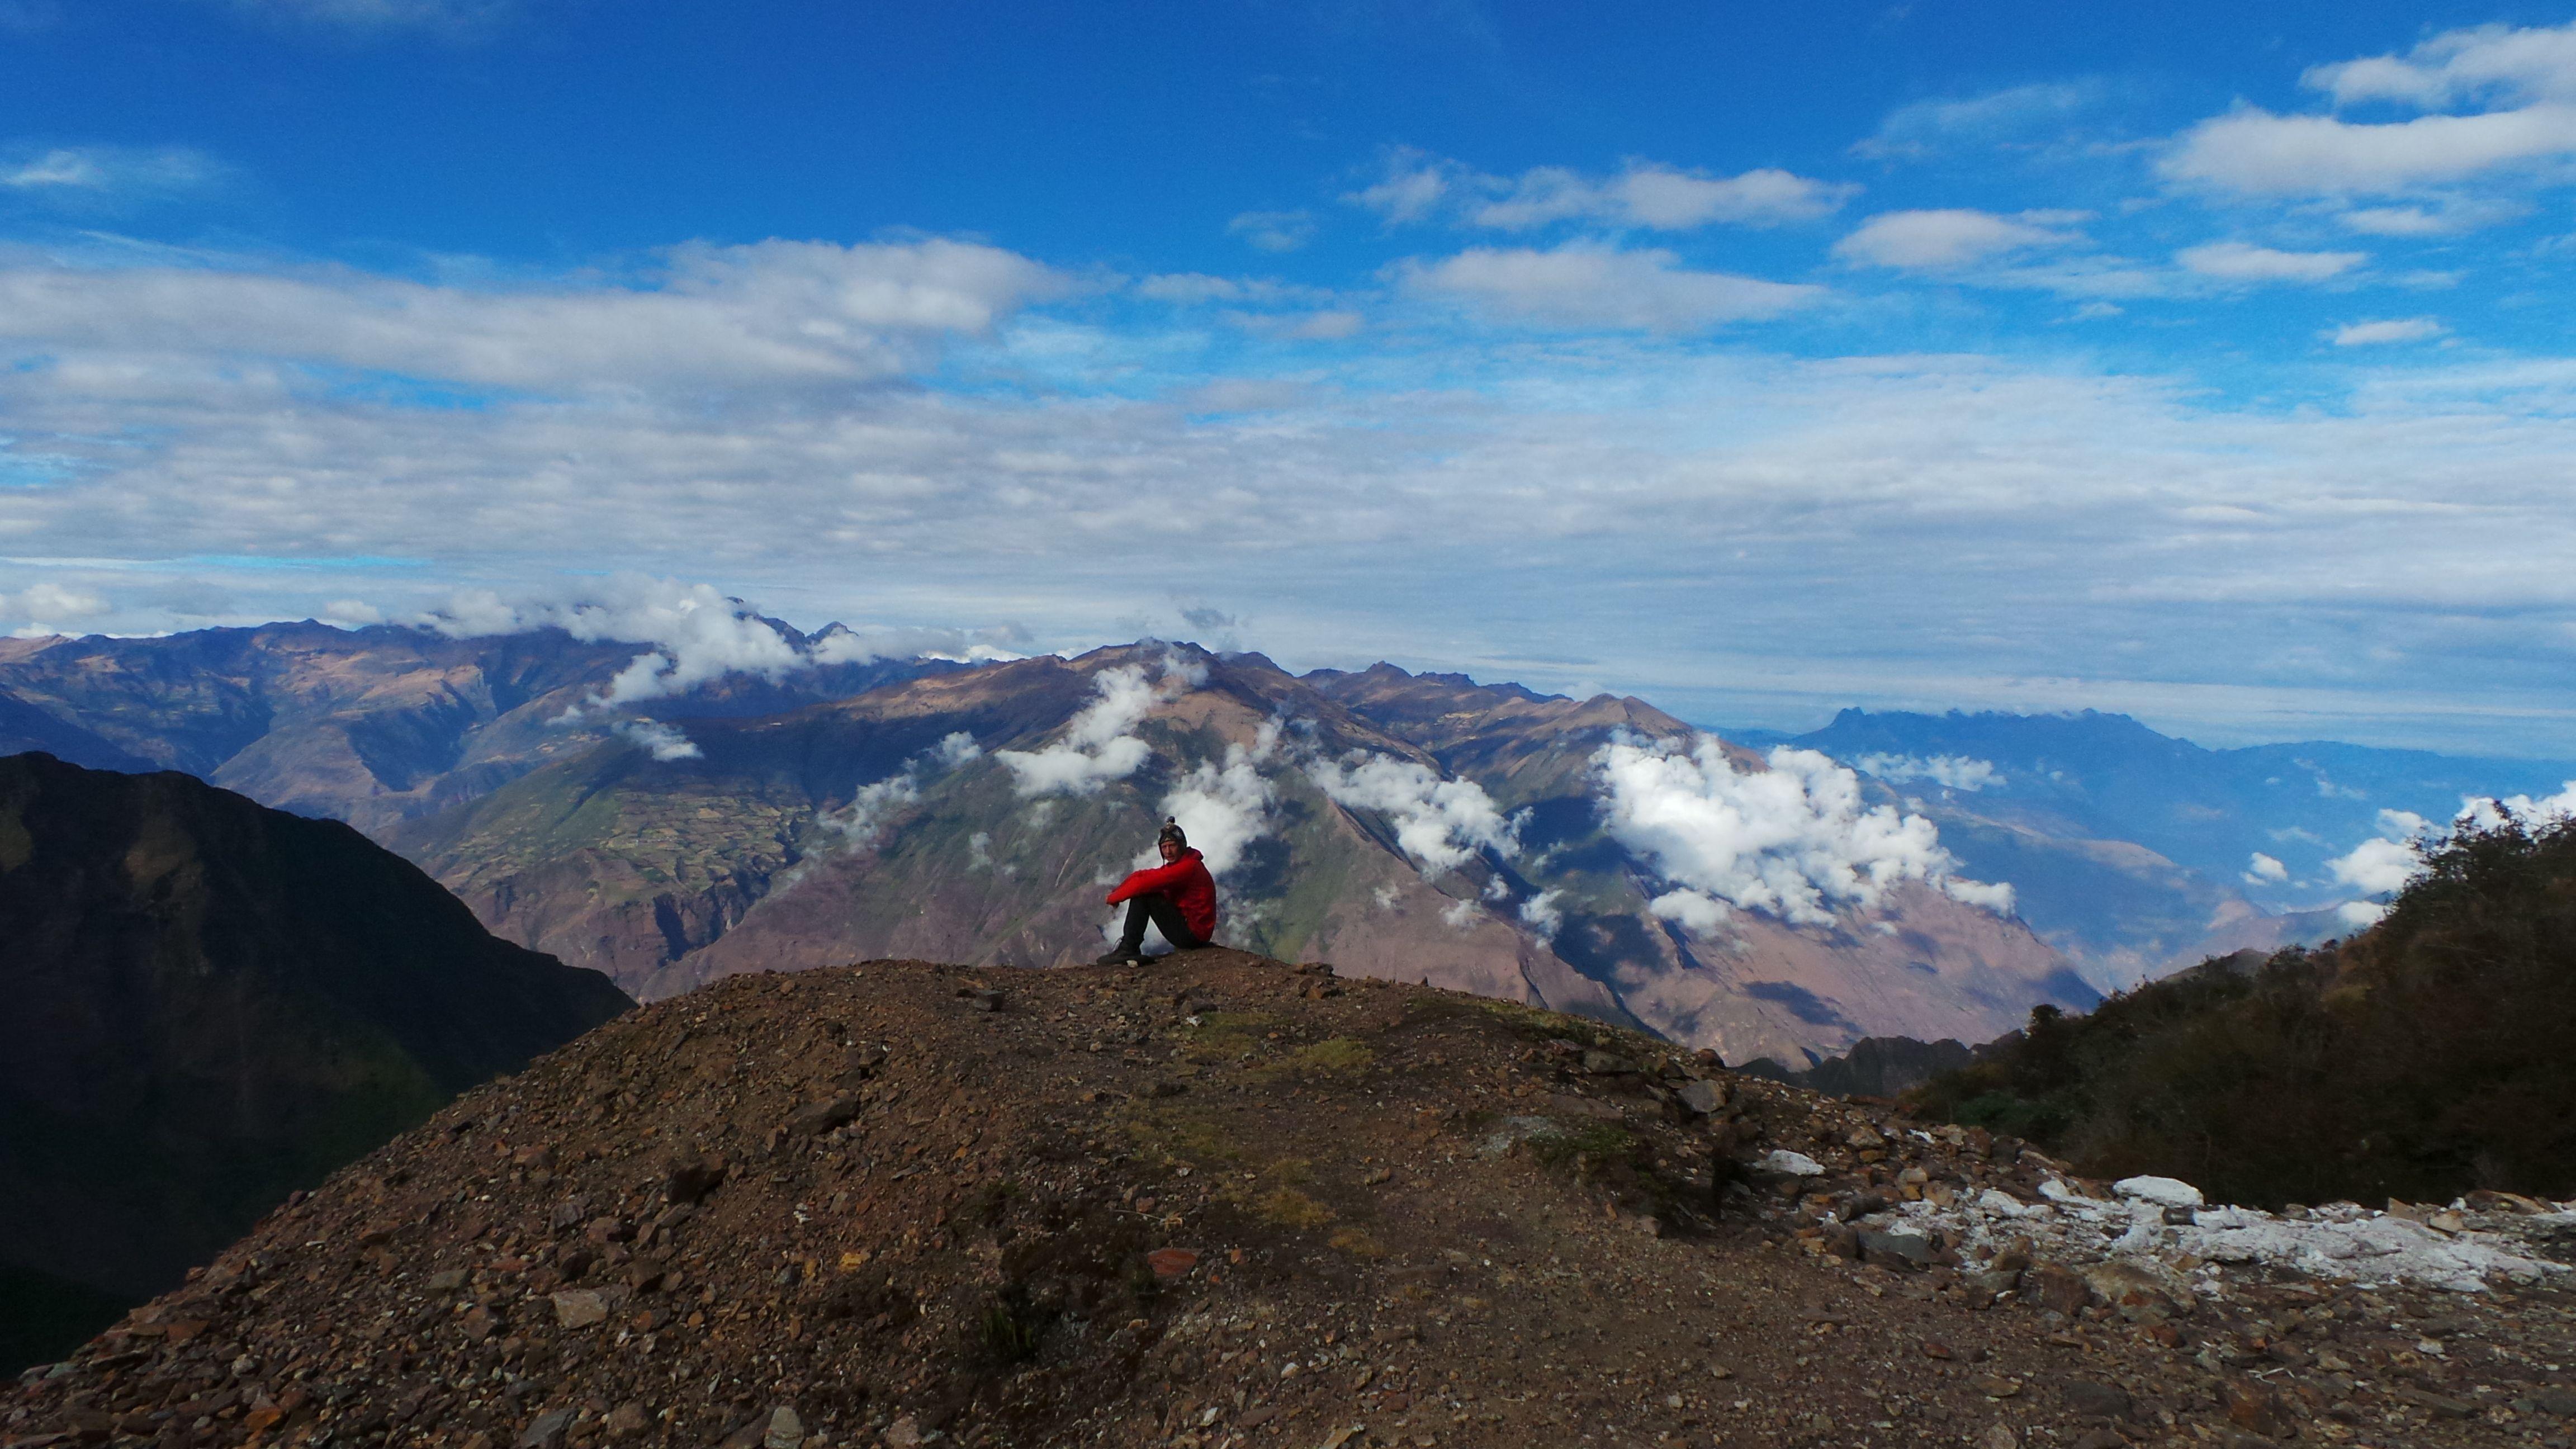 Amazing landscape!!! #XtremeTourbulencia #Choquequirao #Cusco #Peru